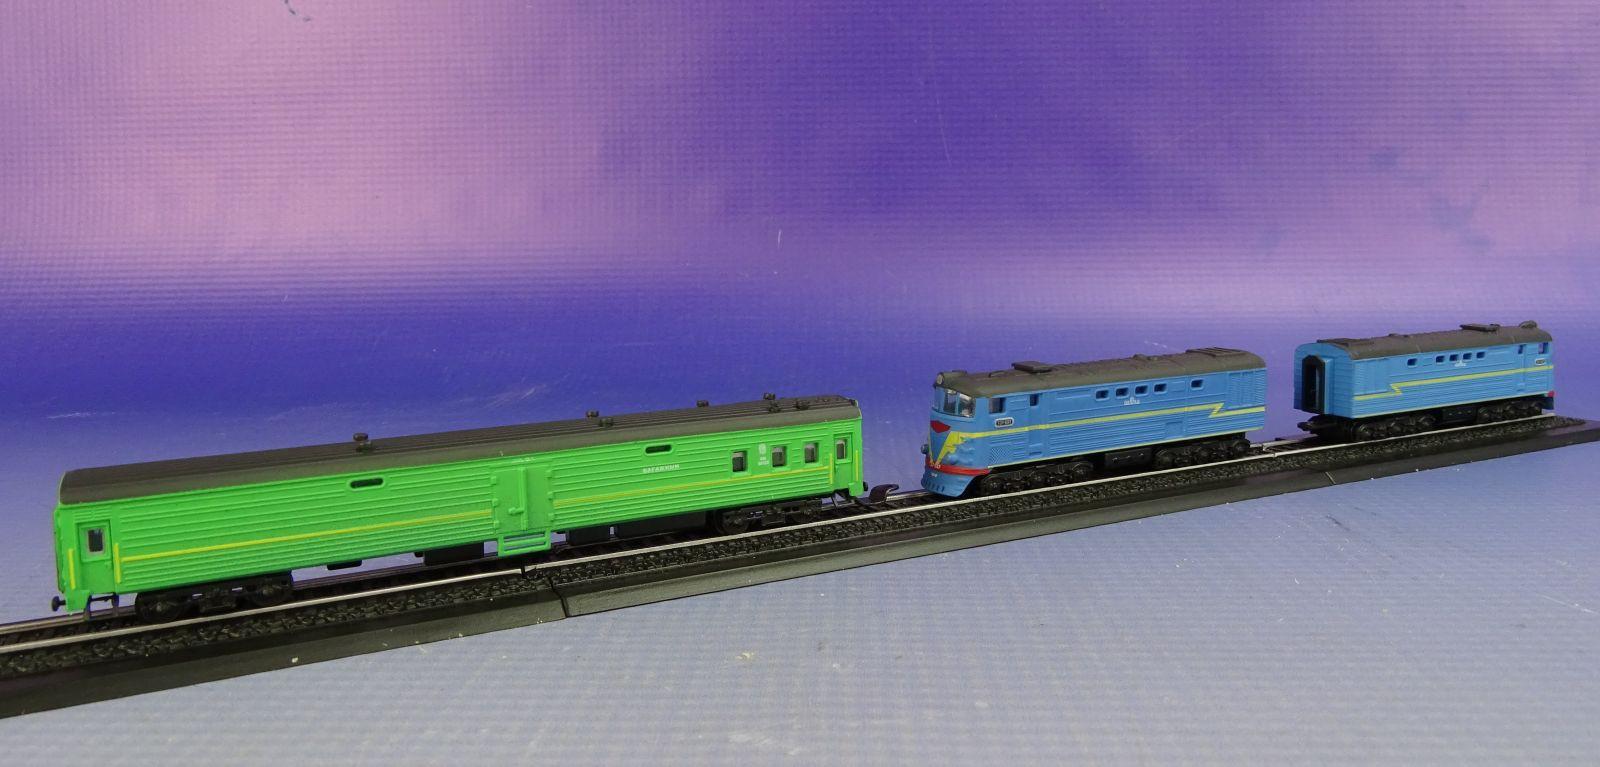 DSC02301.JPG (1600�767)